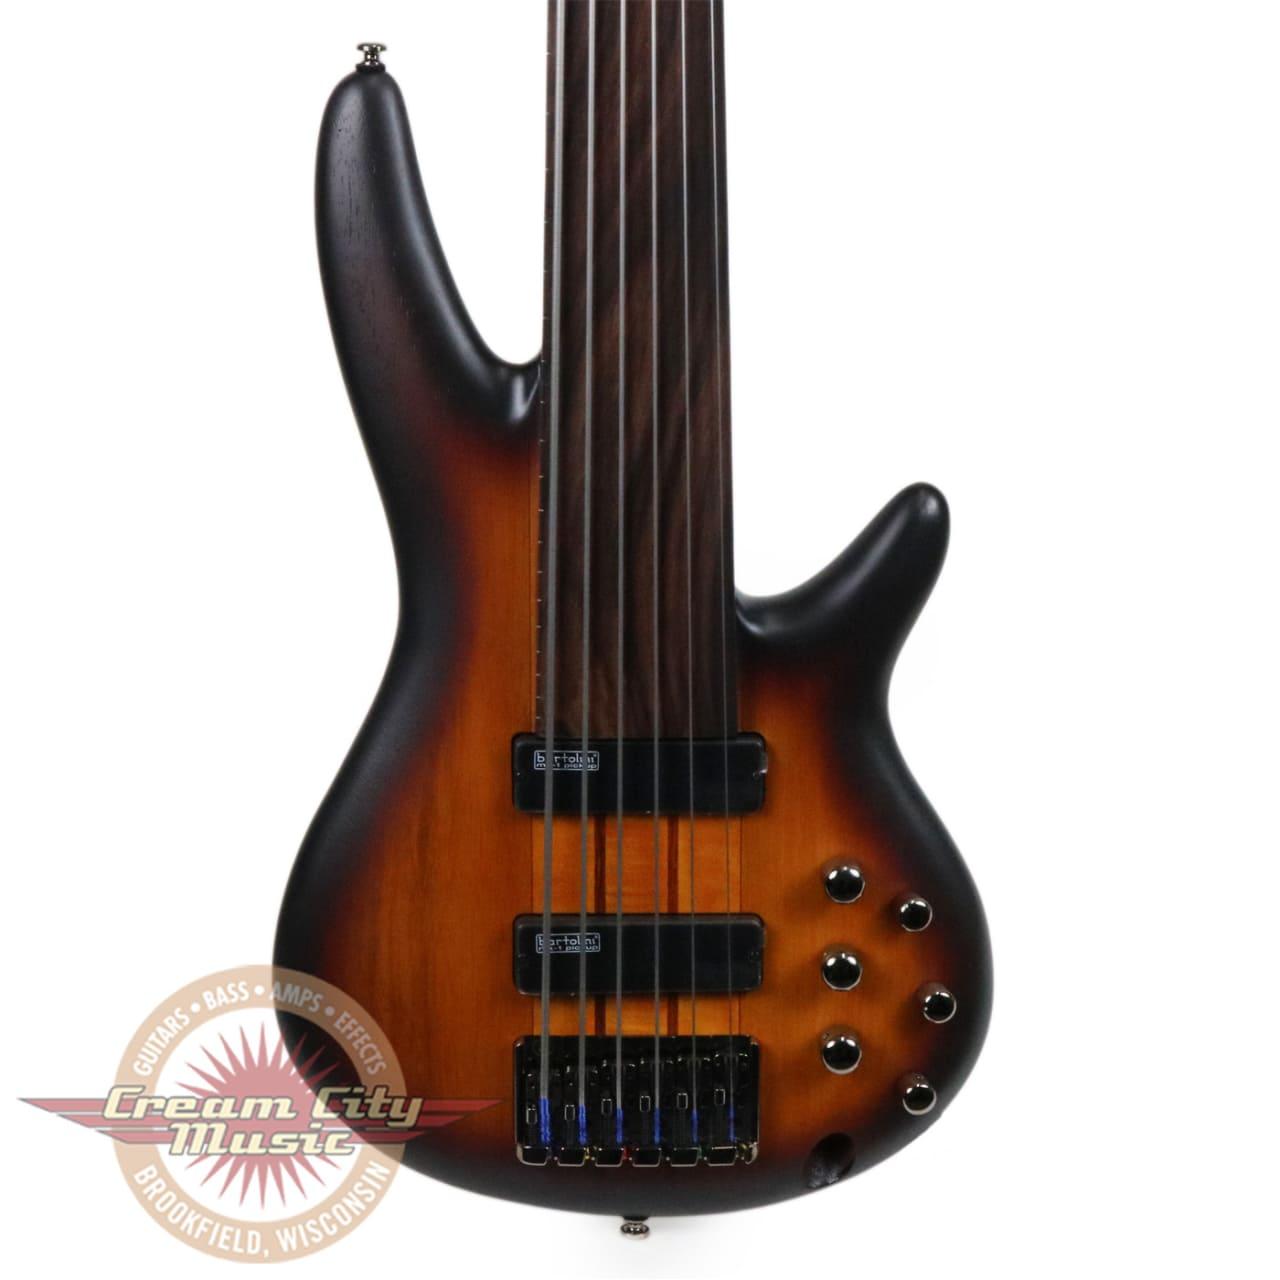 Brand New Ibanez Srf706 Ibanez Workshop 6 String Fretless